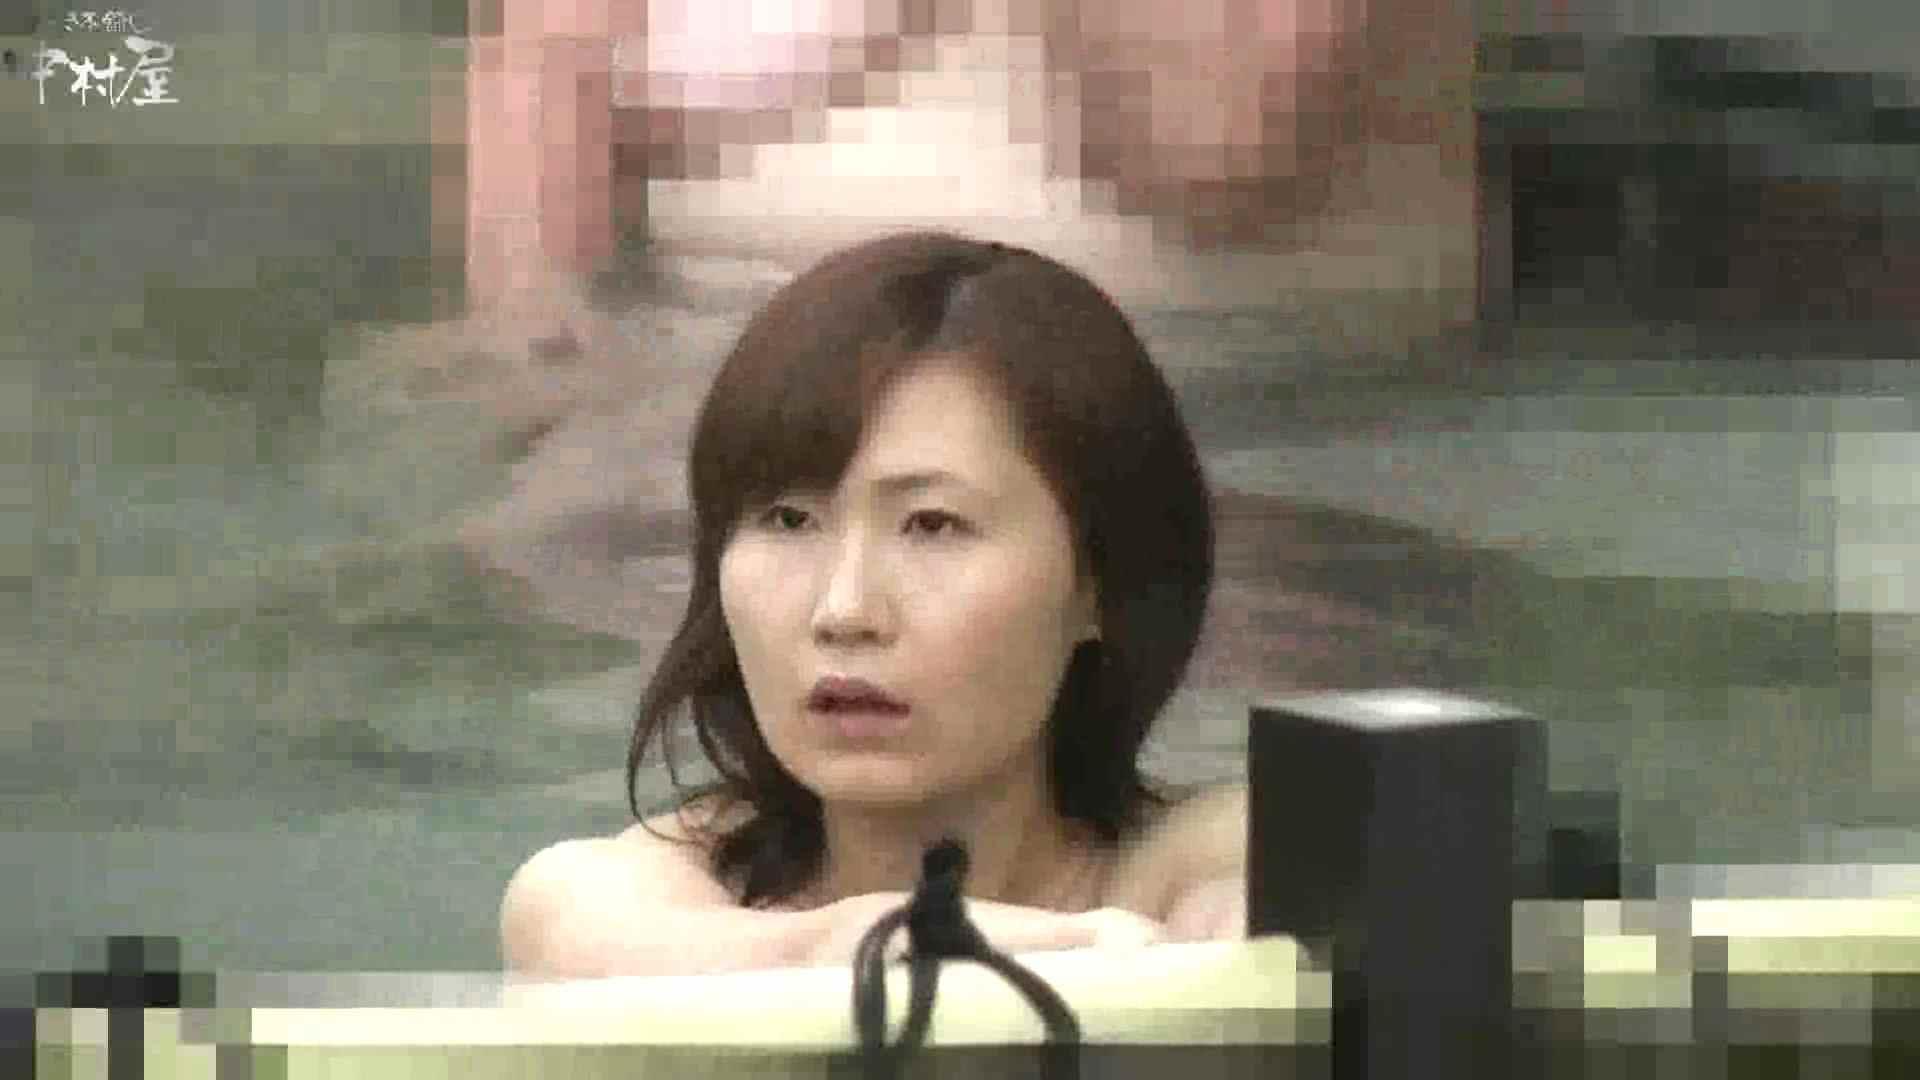 Aquaな露天風呂Vol.877潜入盗撮露天風呂十三判湯 其の二 HなOL AV無料 106pic 50